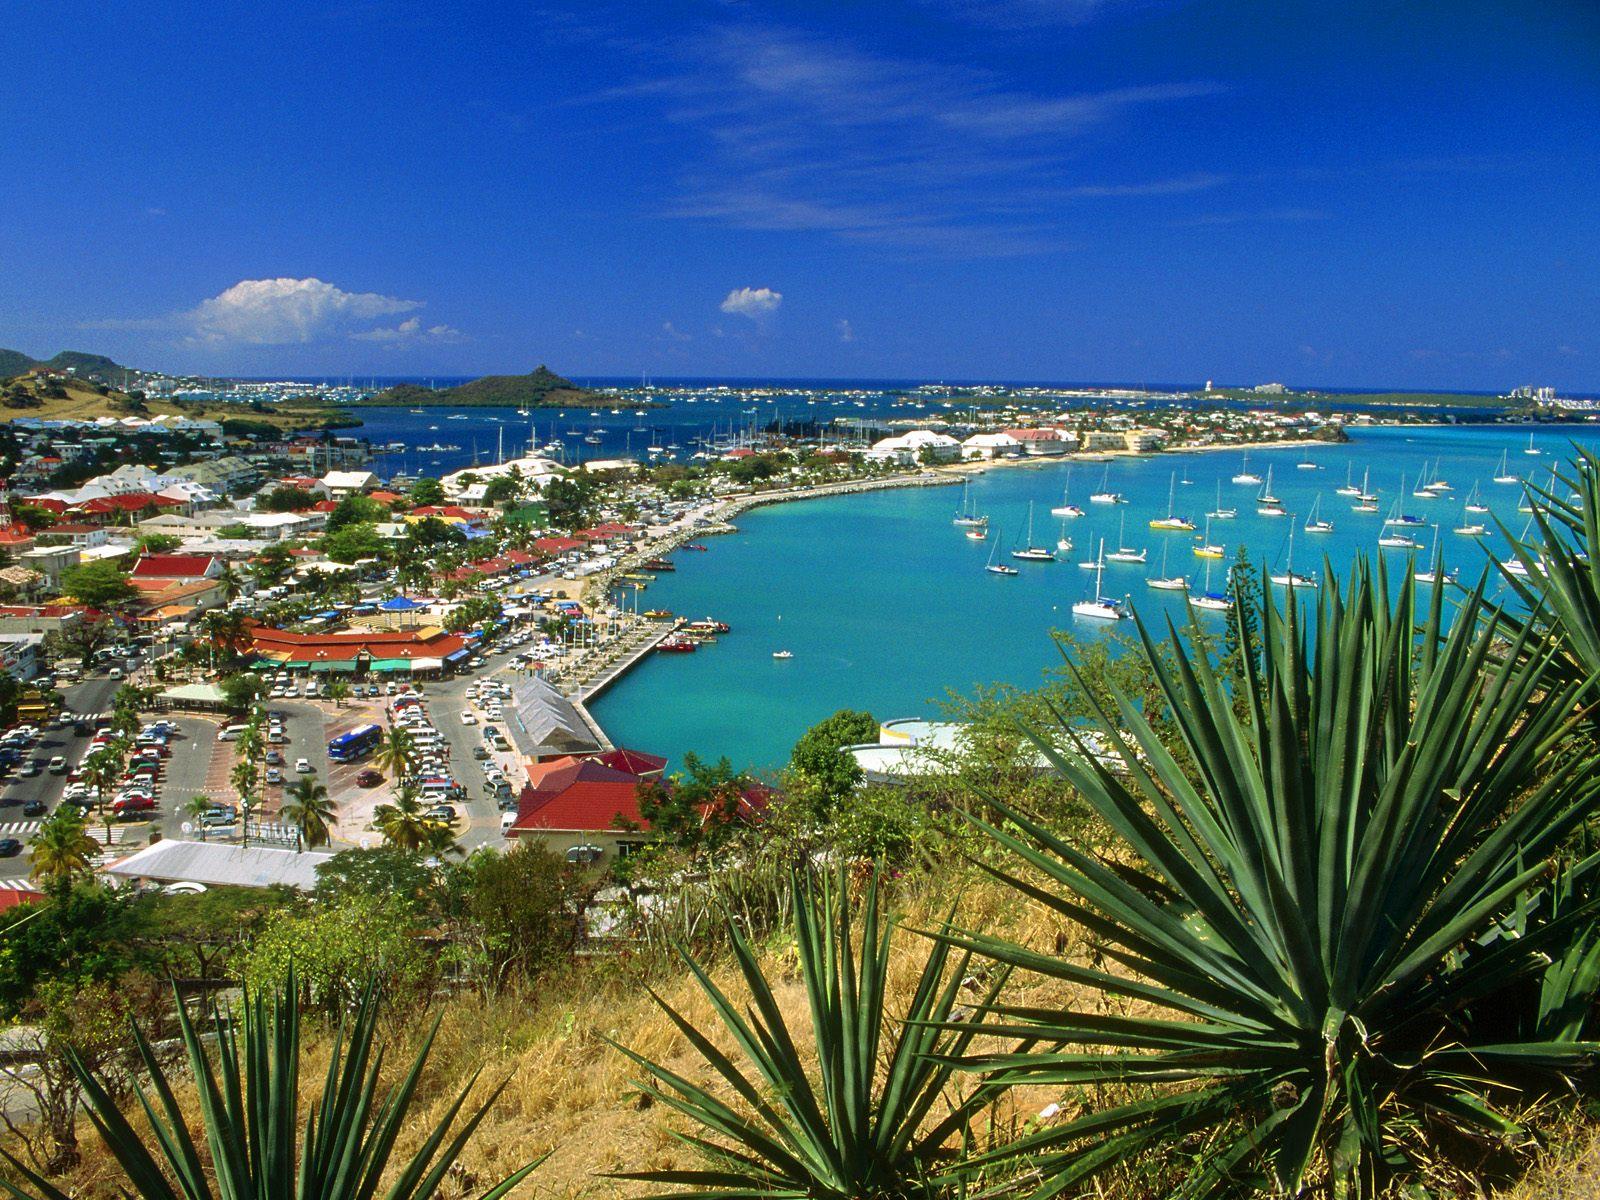 http://3.bp.blogspot.com/-dlEQ9ydU55o/Tv3nlqh6oKI/AAAAAAAADZg/mWB5S_UaV-Y/s1600/Marigot+Bay%252C+Saint+Martin%252C+French+West+Indies.jpg